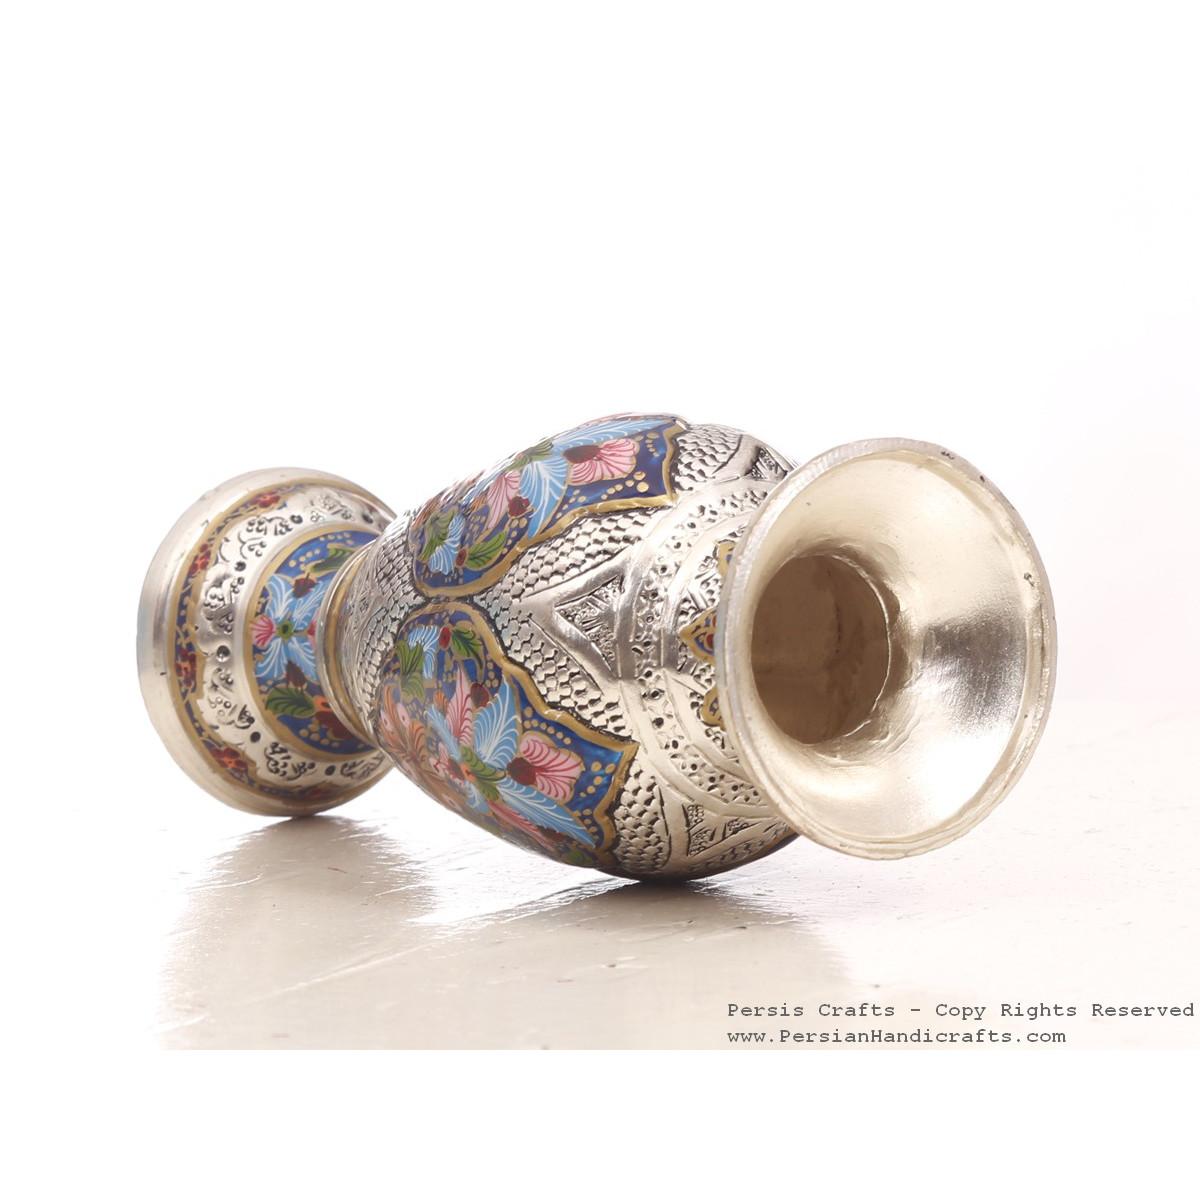 Enamel Engraved Flower Vase - HE3047-Persian Handicrafts